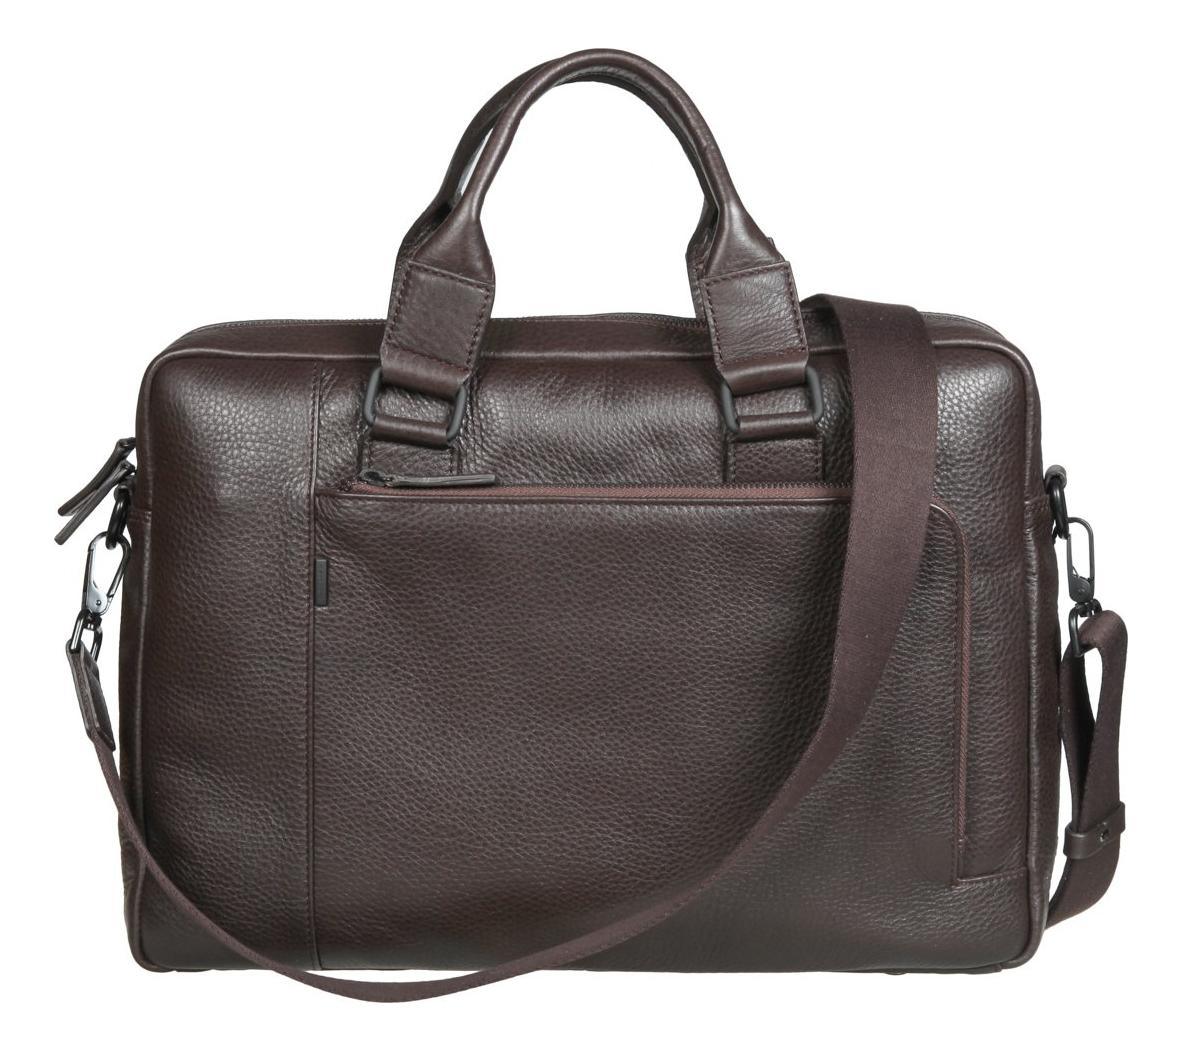 Бизнес-сумка Dark Brown 1811342 cover for avtodokumentov gianni conti 1817456 dark brown